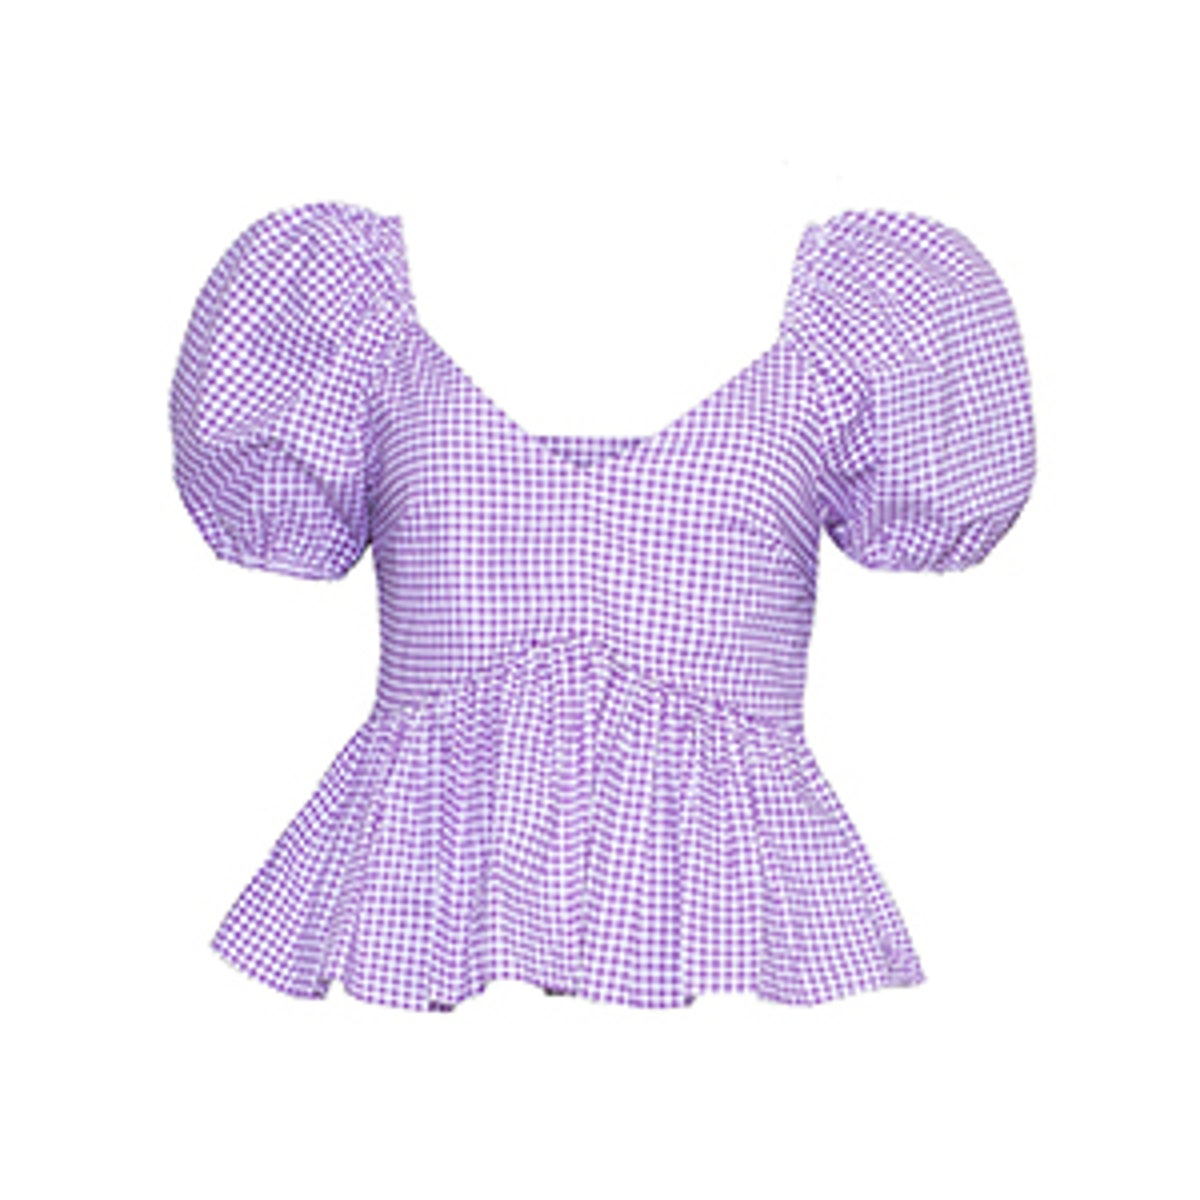 Lavender Gingham Top